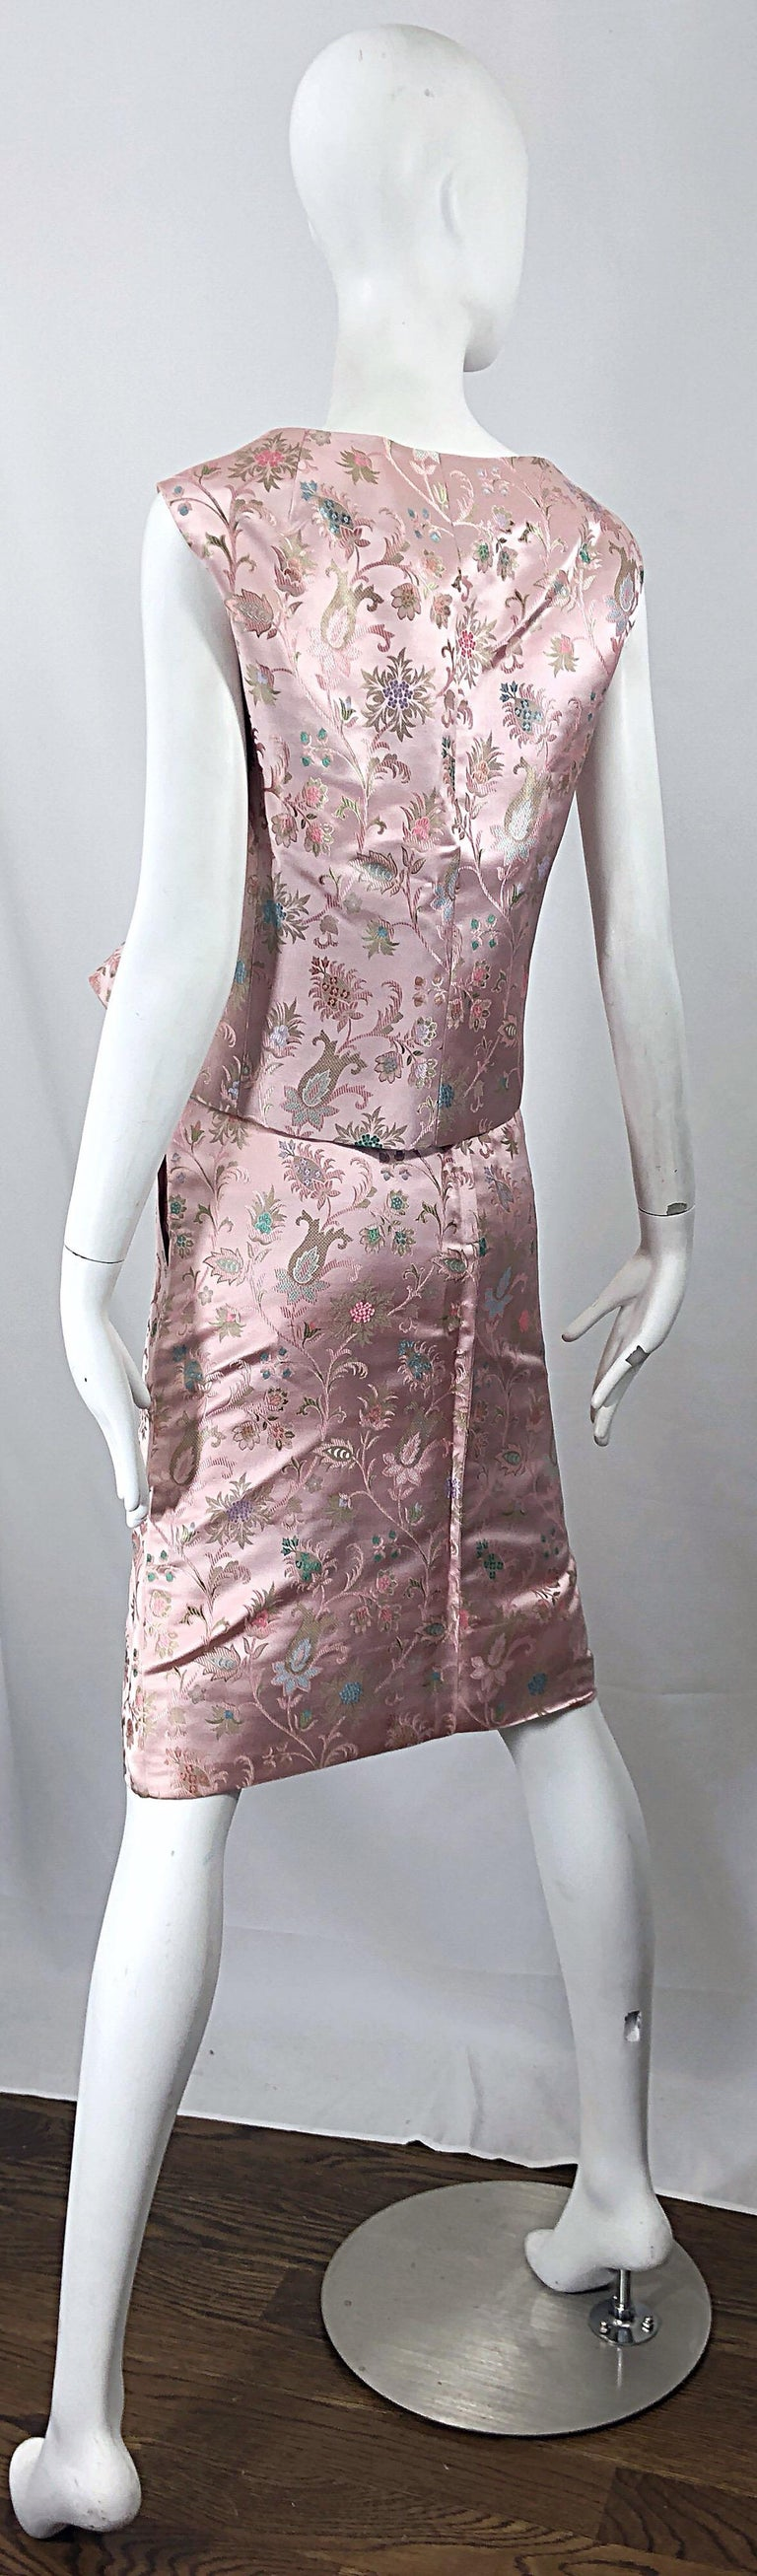 Dynasty 1960s For Lord & Taylor Light Pink Large Size 3 Piece Vintage Dress Set For Sale 6